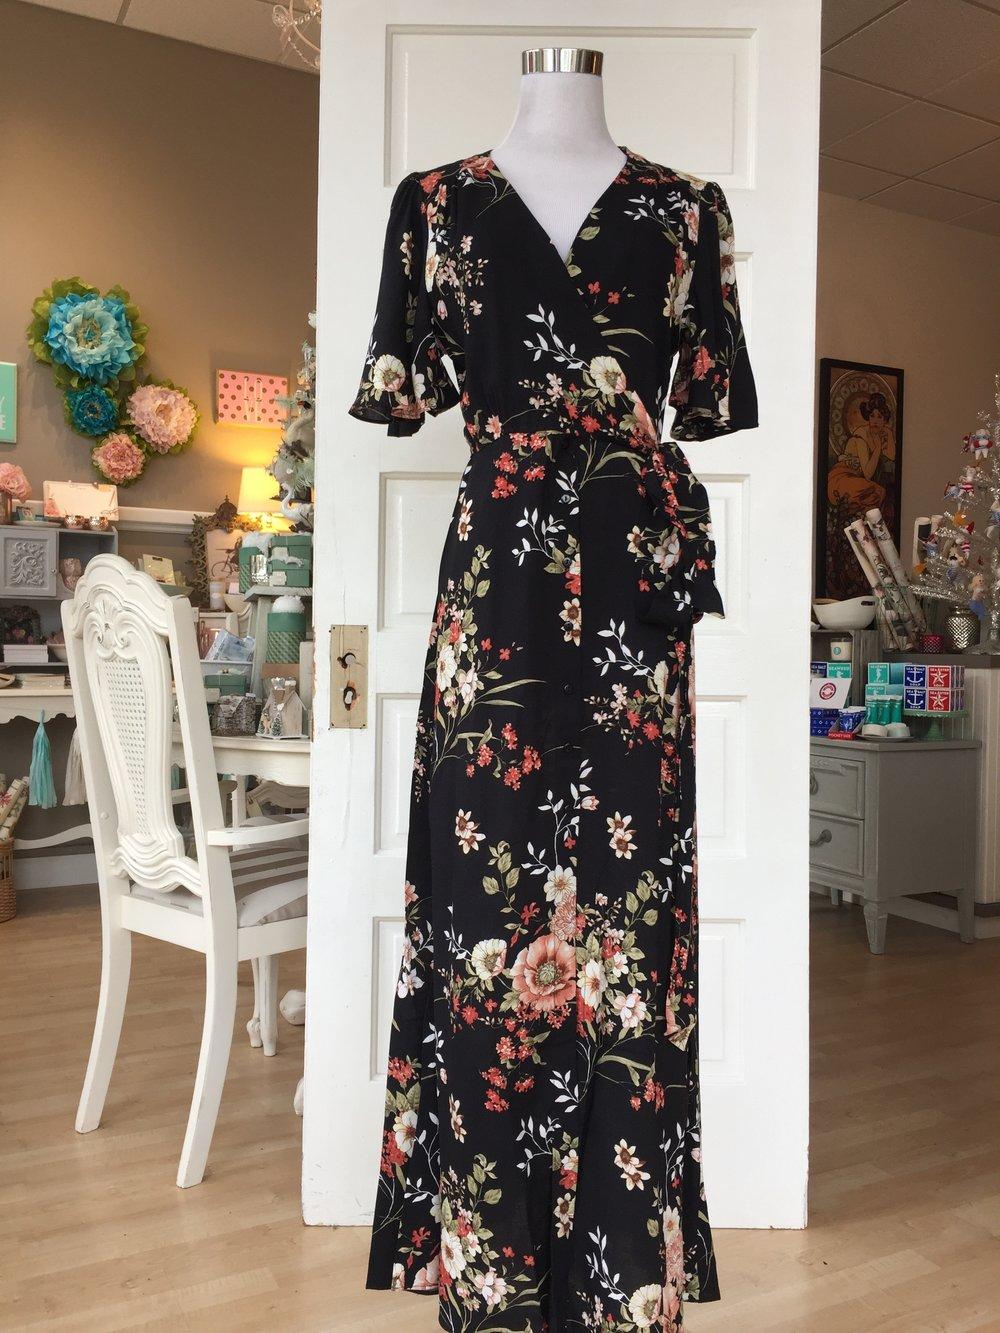 Floral wrap maxi dress ($48)